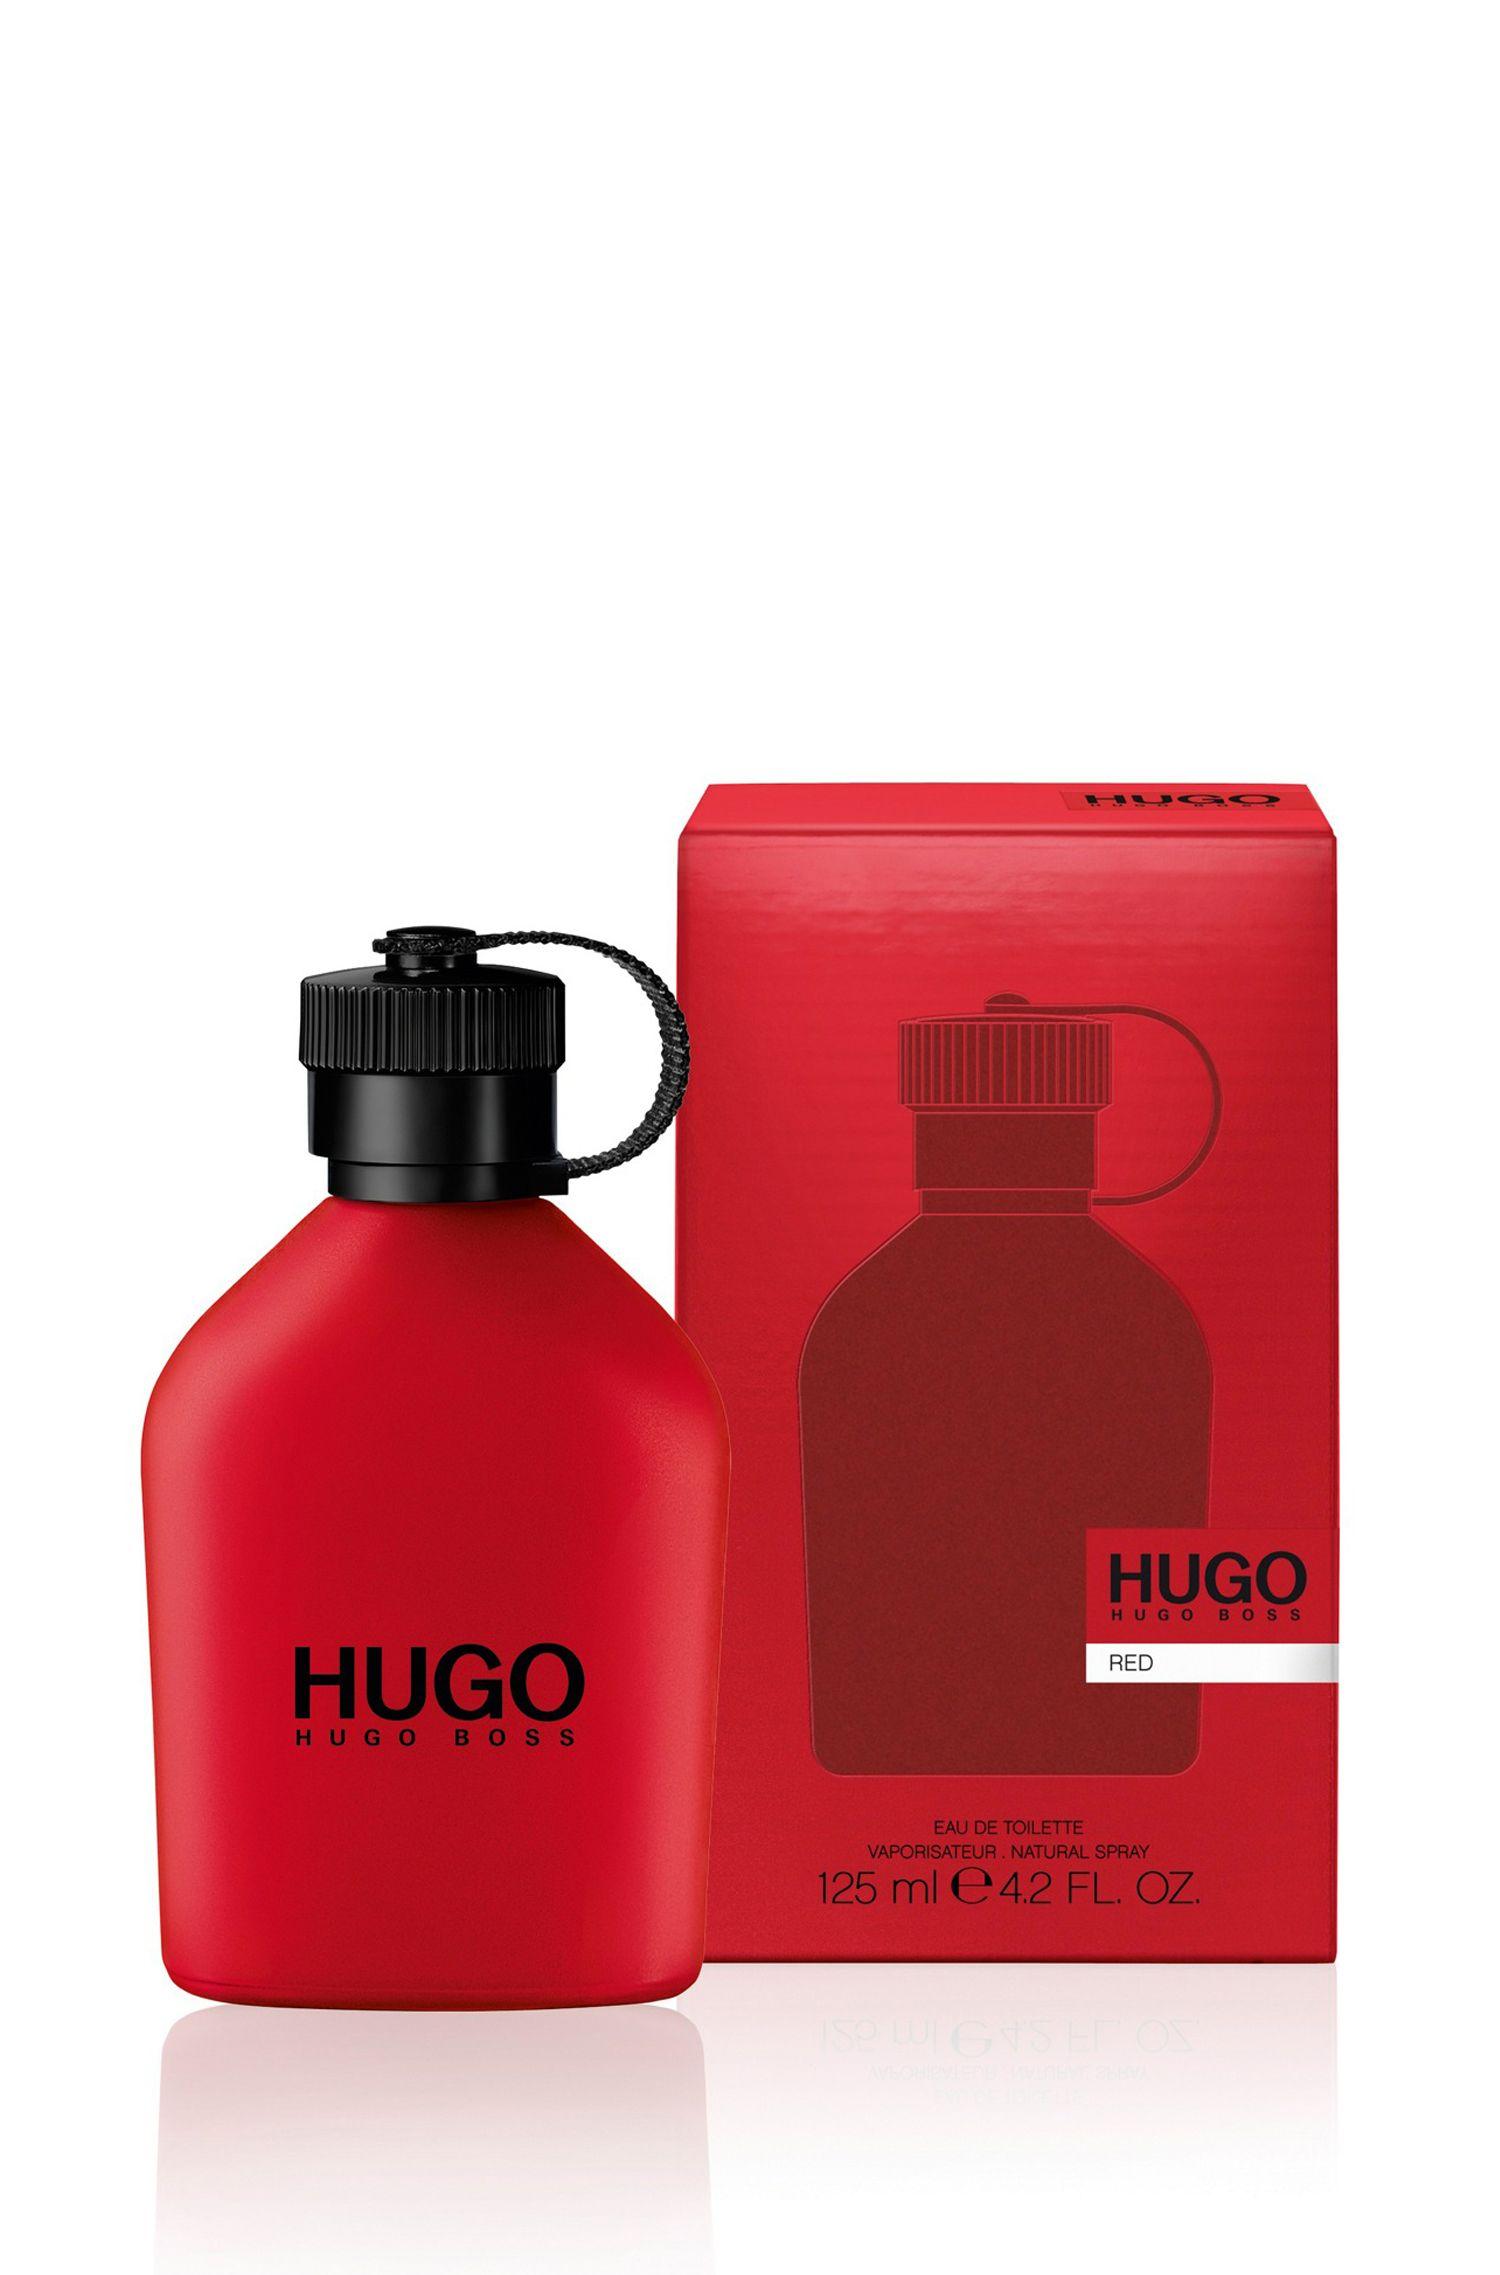 'HUGO Red'   4.2 fl. oz. (125 mL) Eau de Toilette